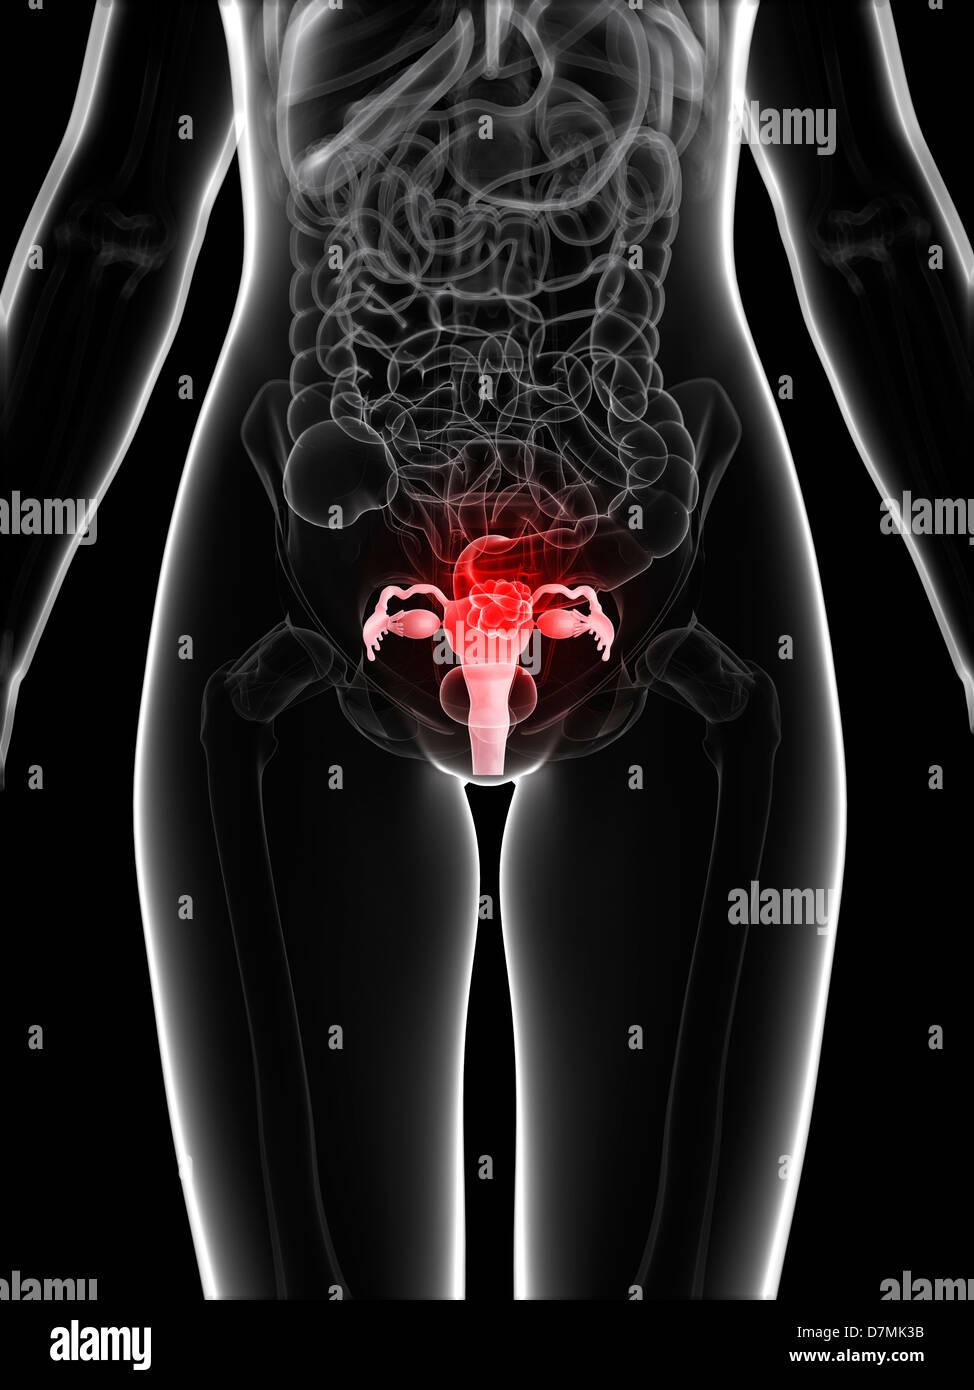 Uterine cancer, artwork - Stock Image